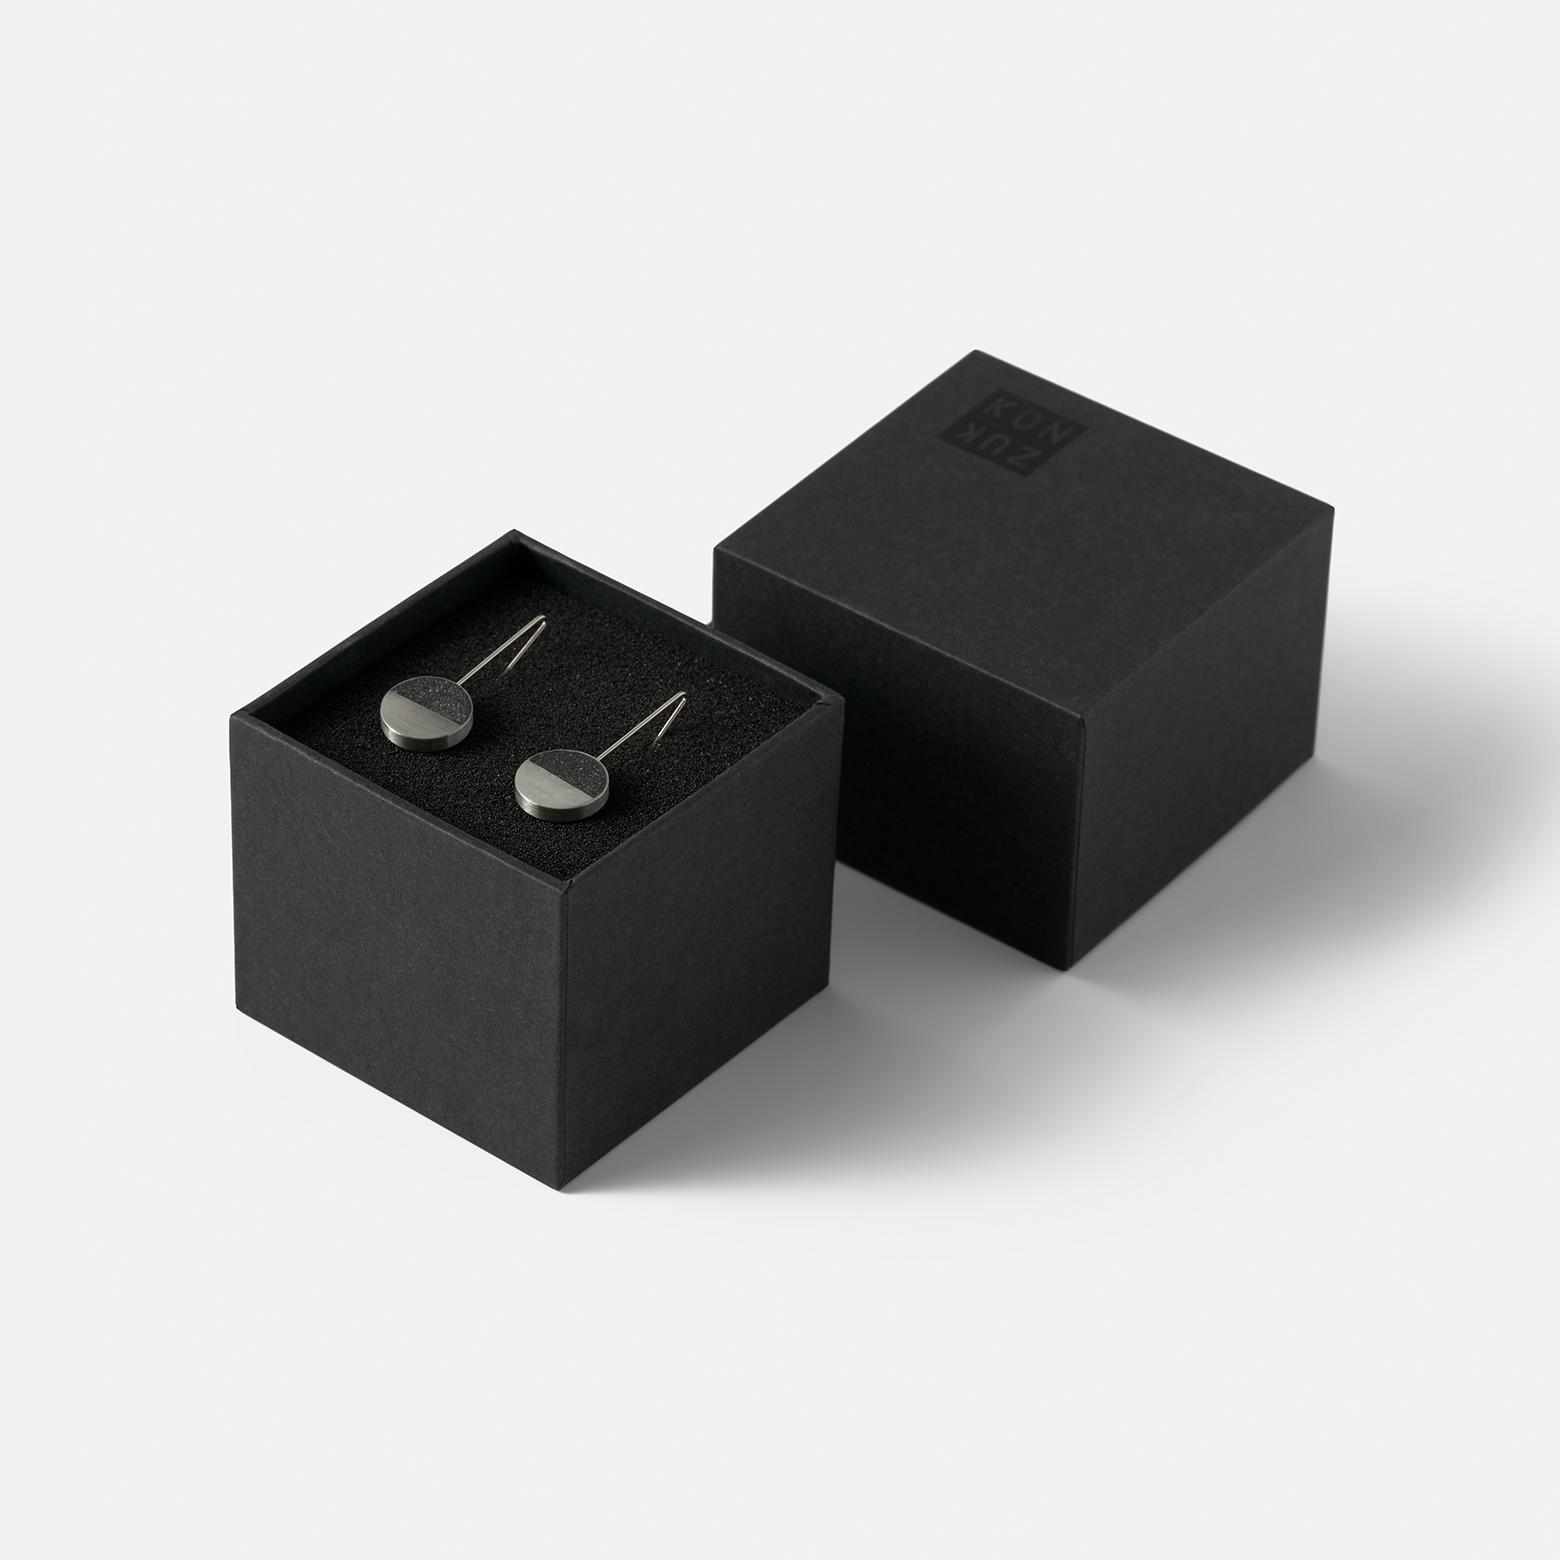 Konzuk Capella Minor Earring — серьги из бетона и стали